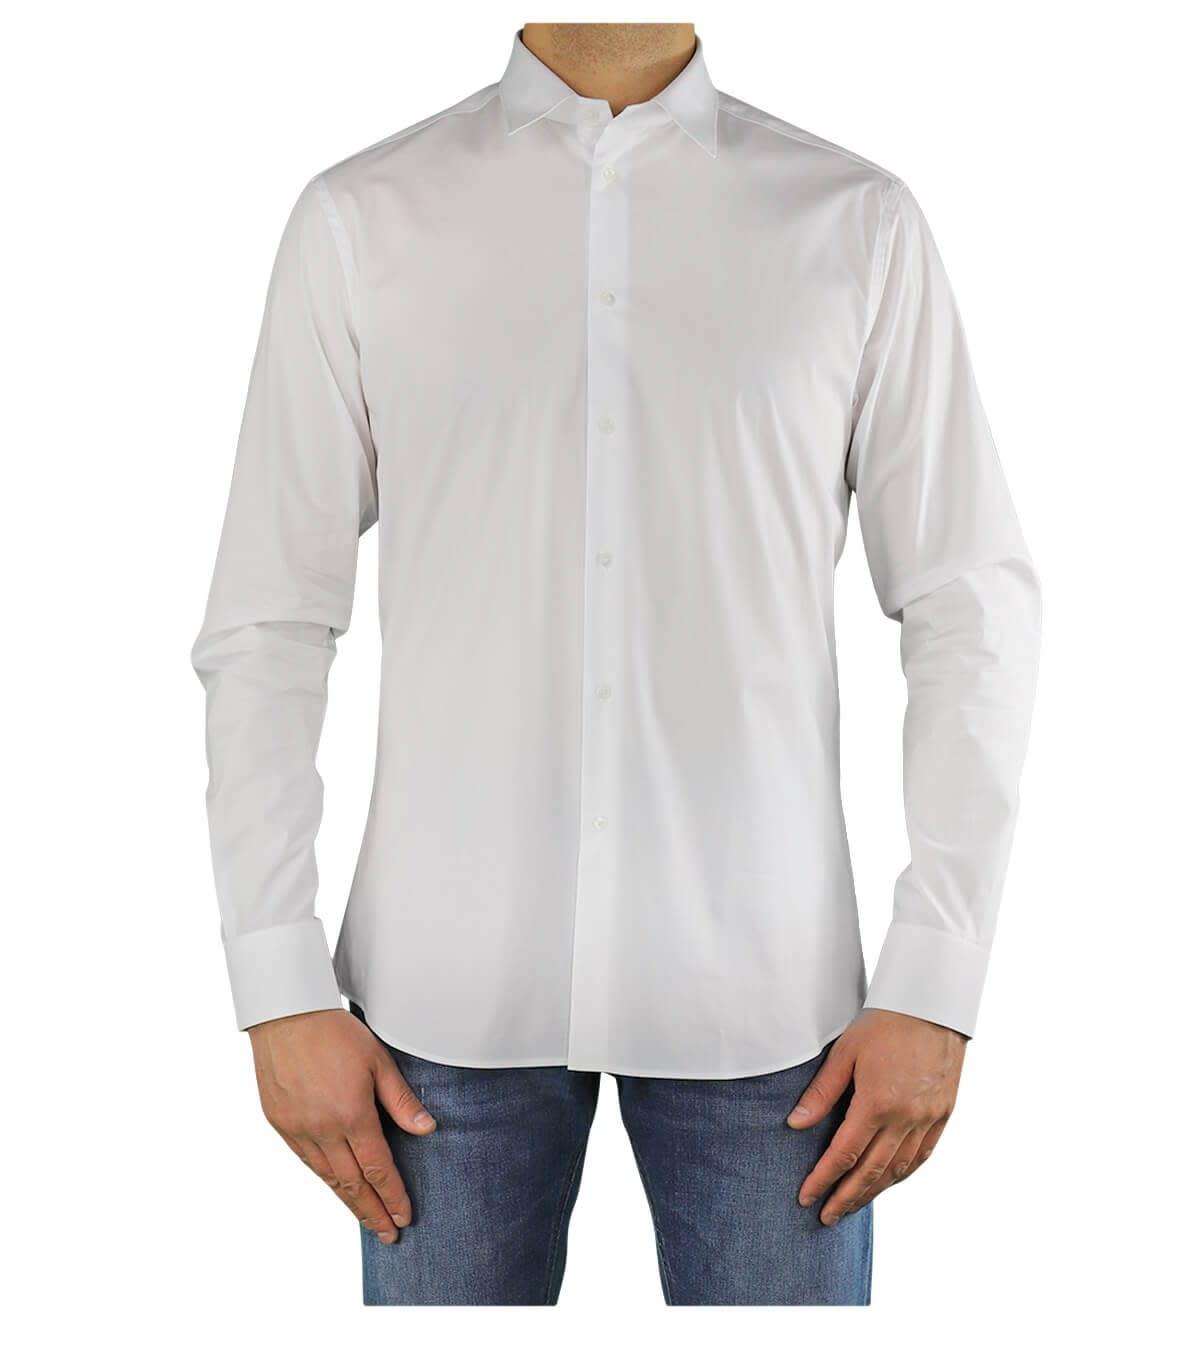 Paolo Pecora Cottons WHITE POPELINE SHIRT